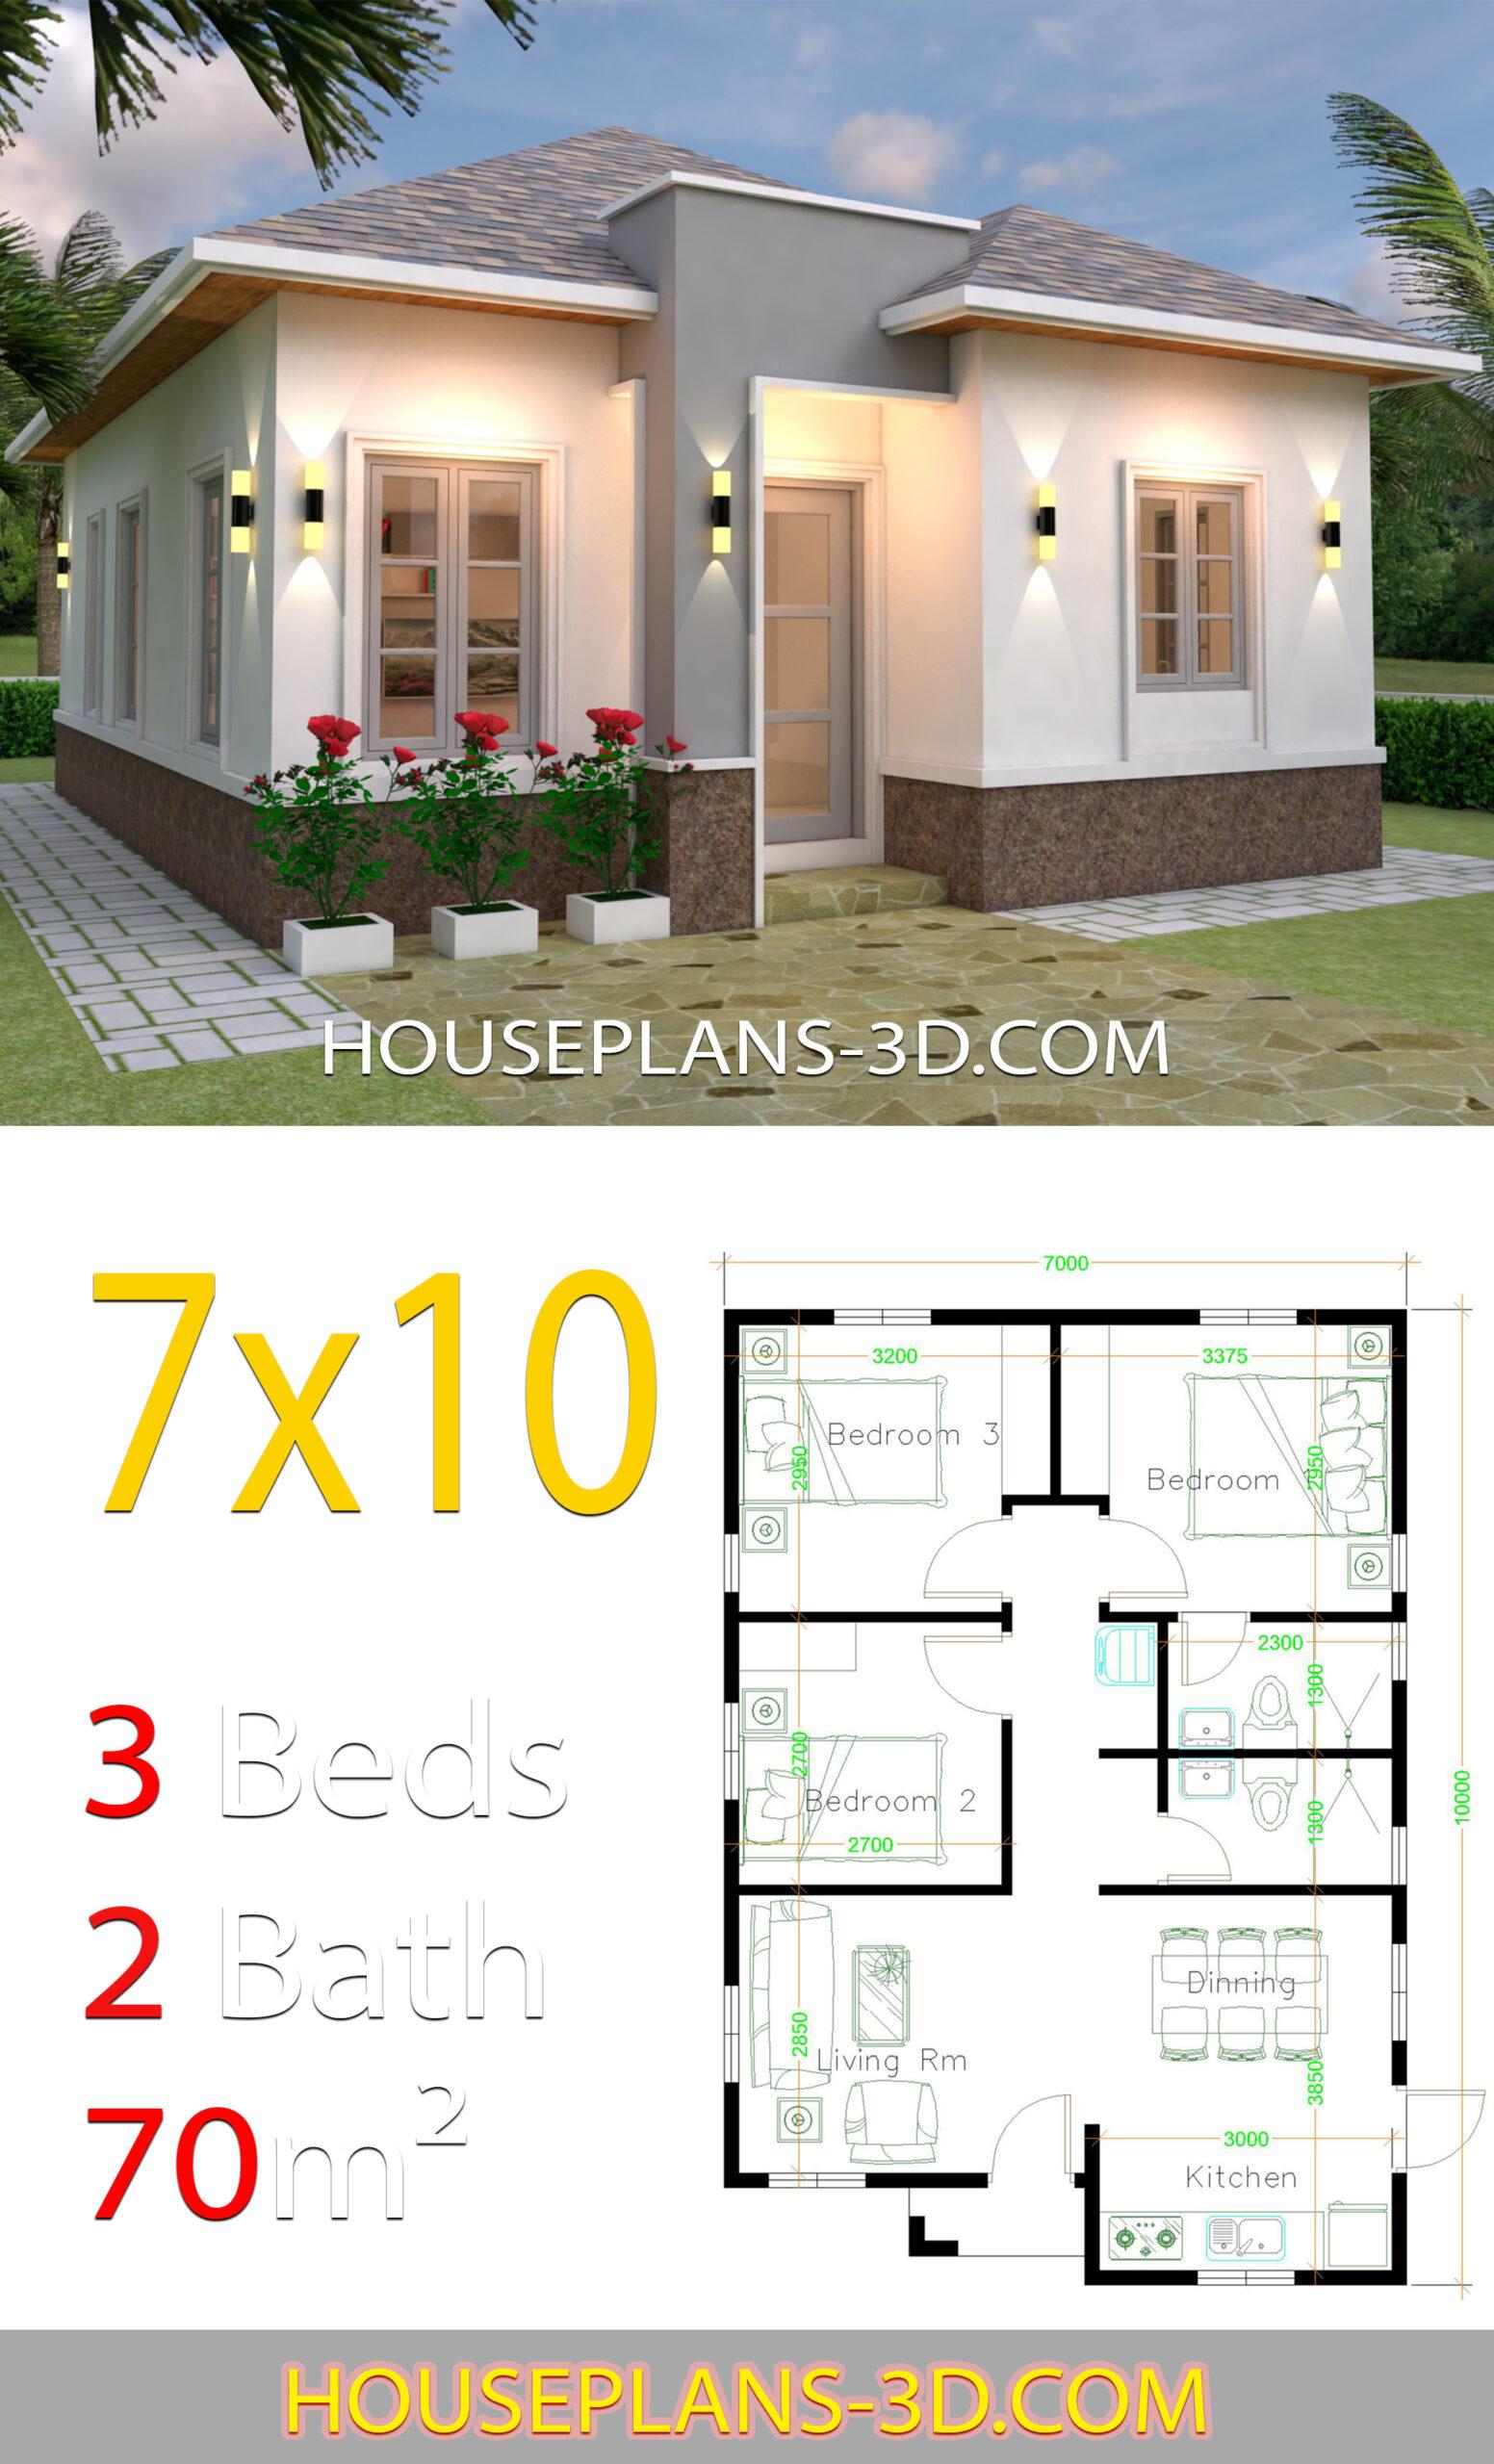 Hip roof Best 3 Bedrooms House with floor plan 7m